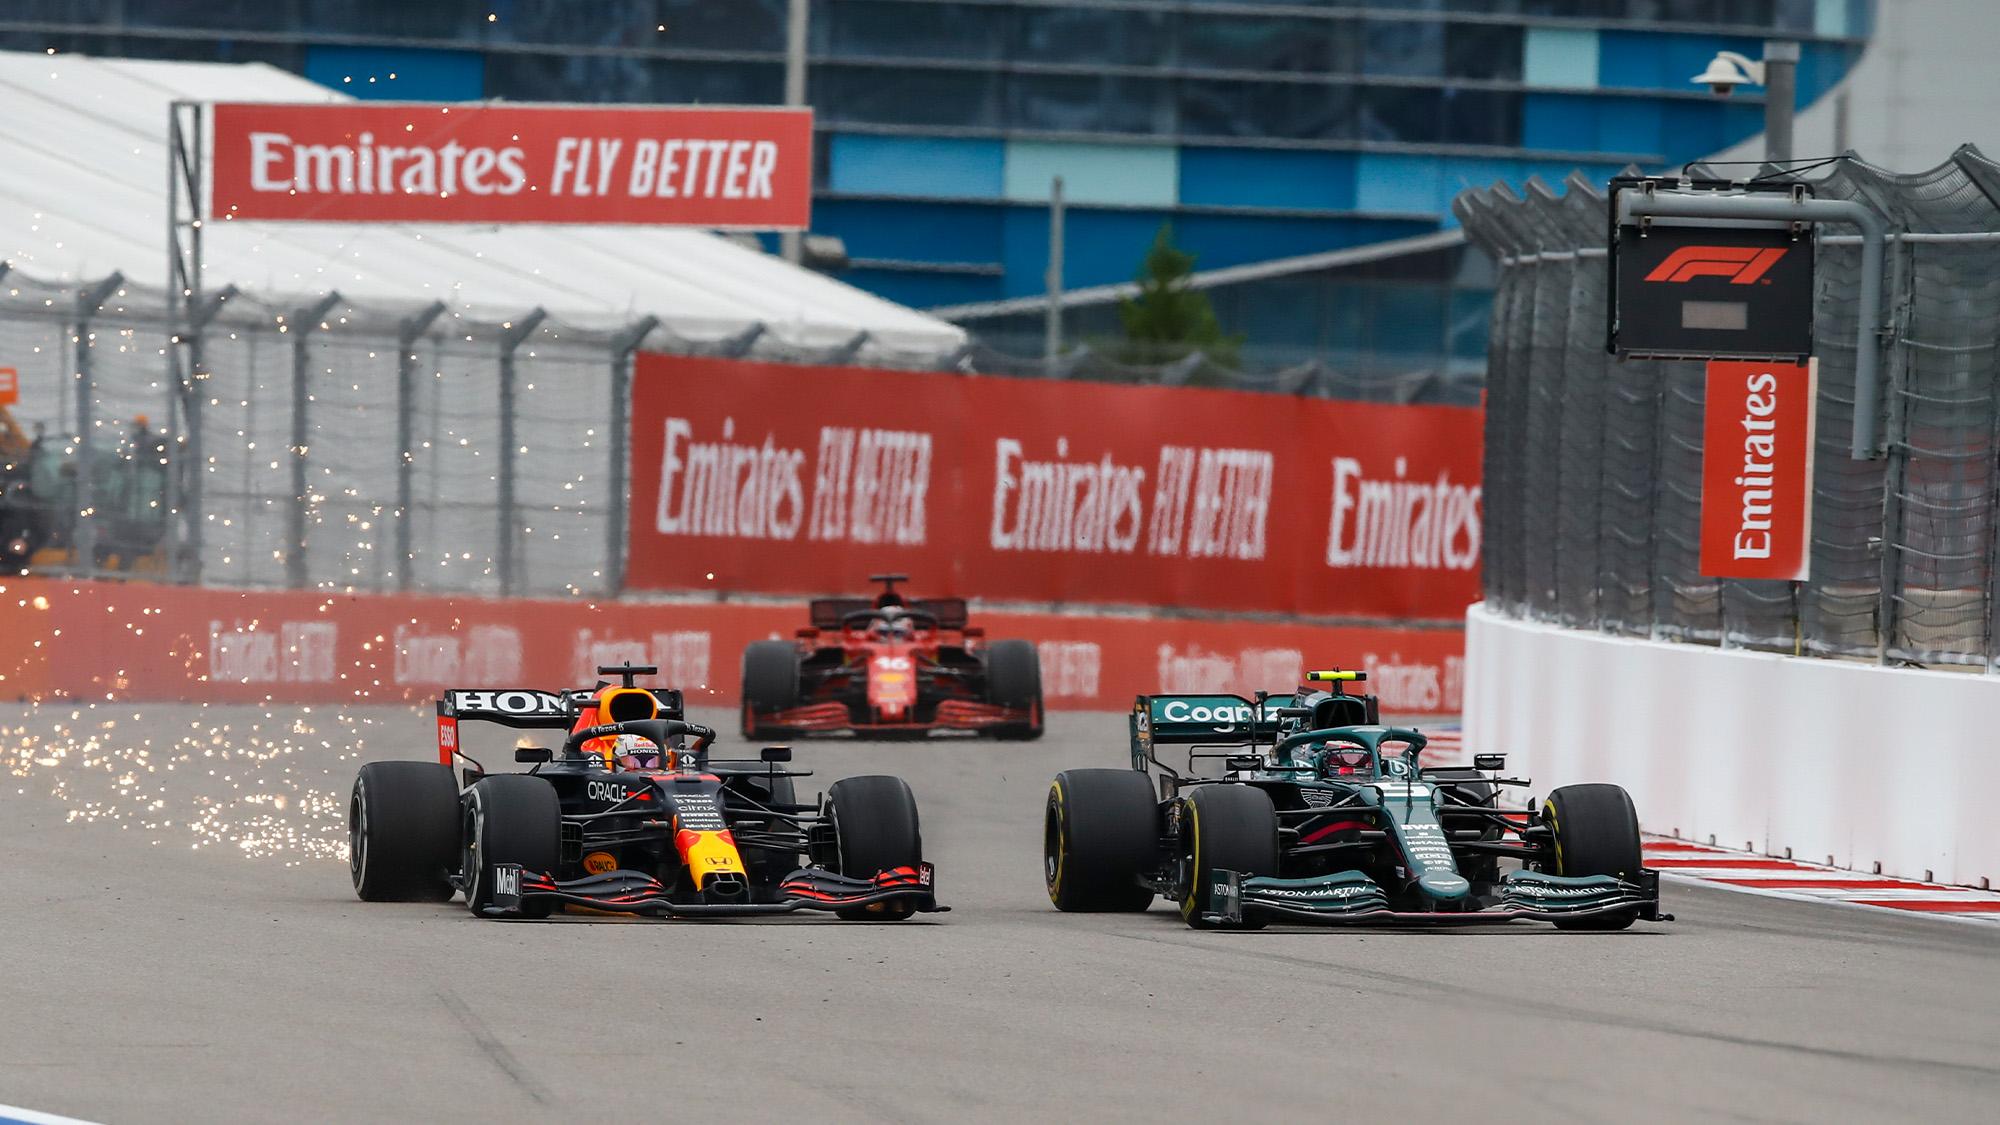 Max Verstappen fights with Sebastian Vettel in the 2021 Russian Grand Prix